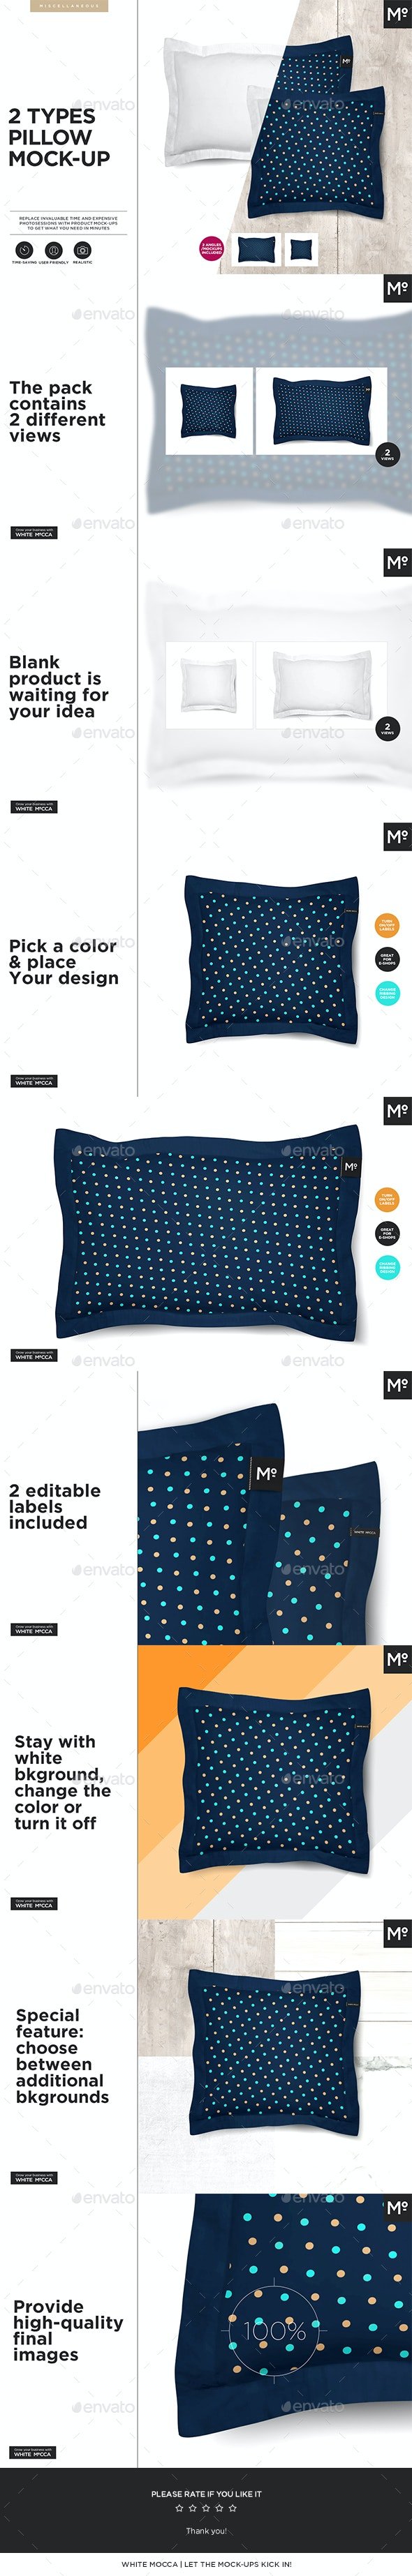 2 Types Pillow Mock-up - Miscellaneous Print